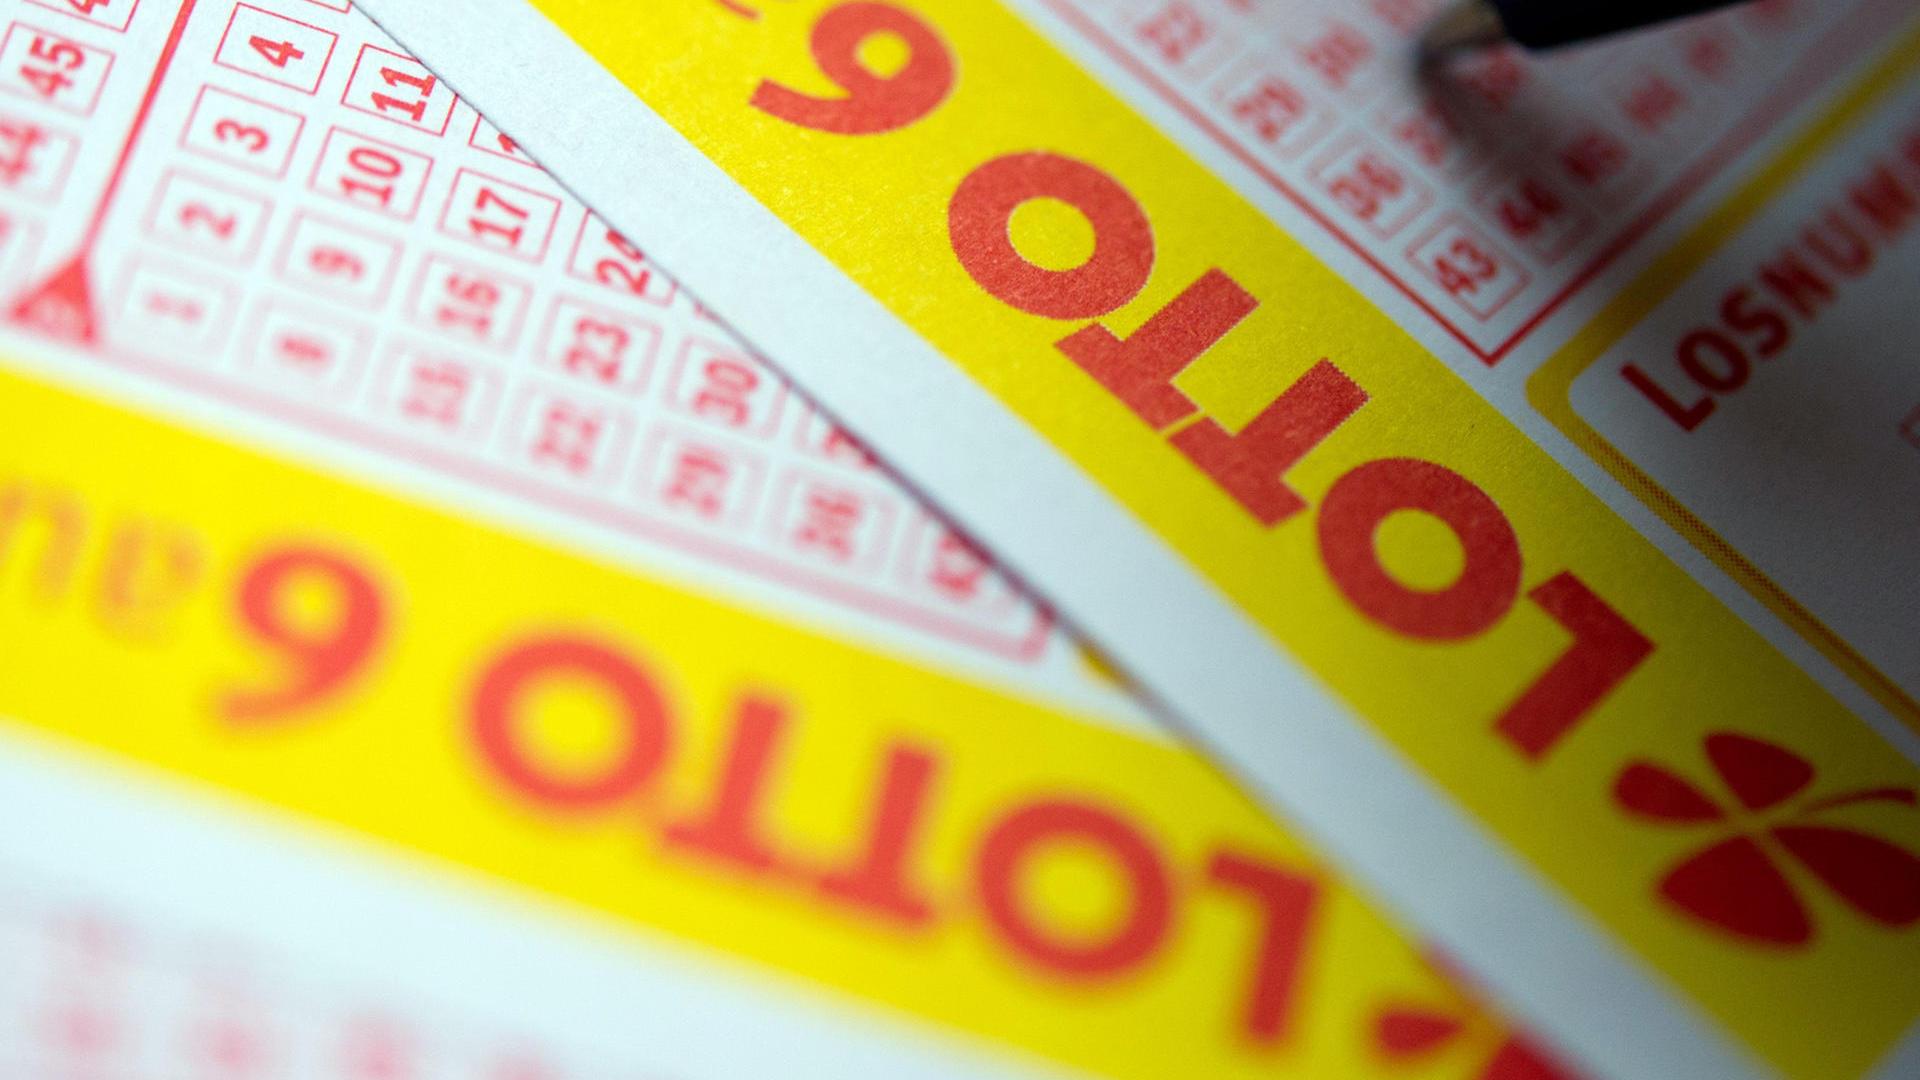 Немецкое «лото 6/49»: платите меньше, выигрывайте больше! - playeurolotto - playeurolotto